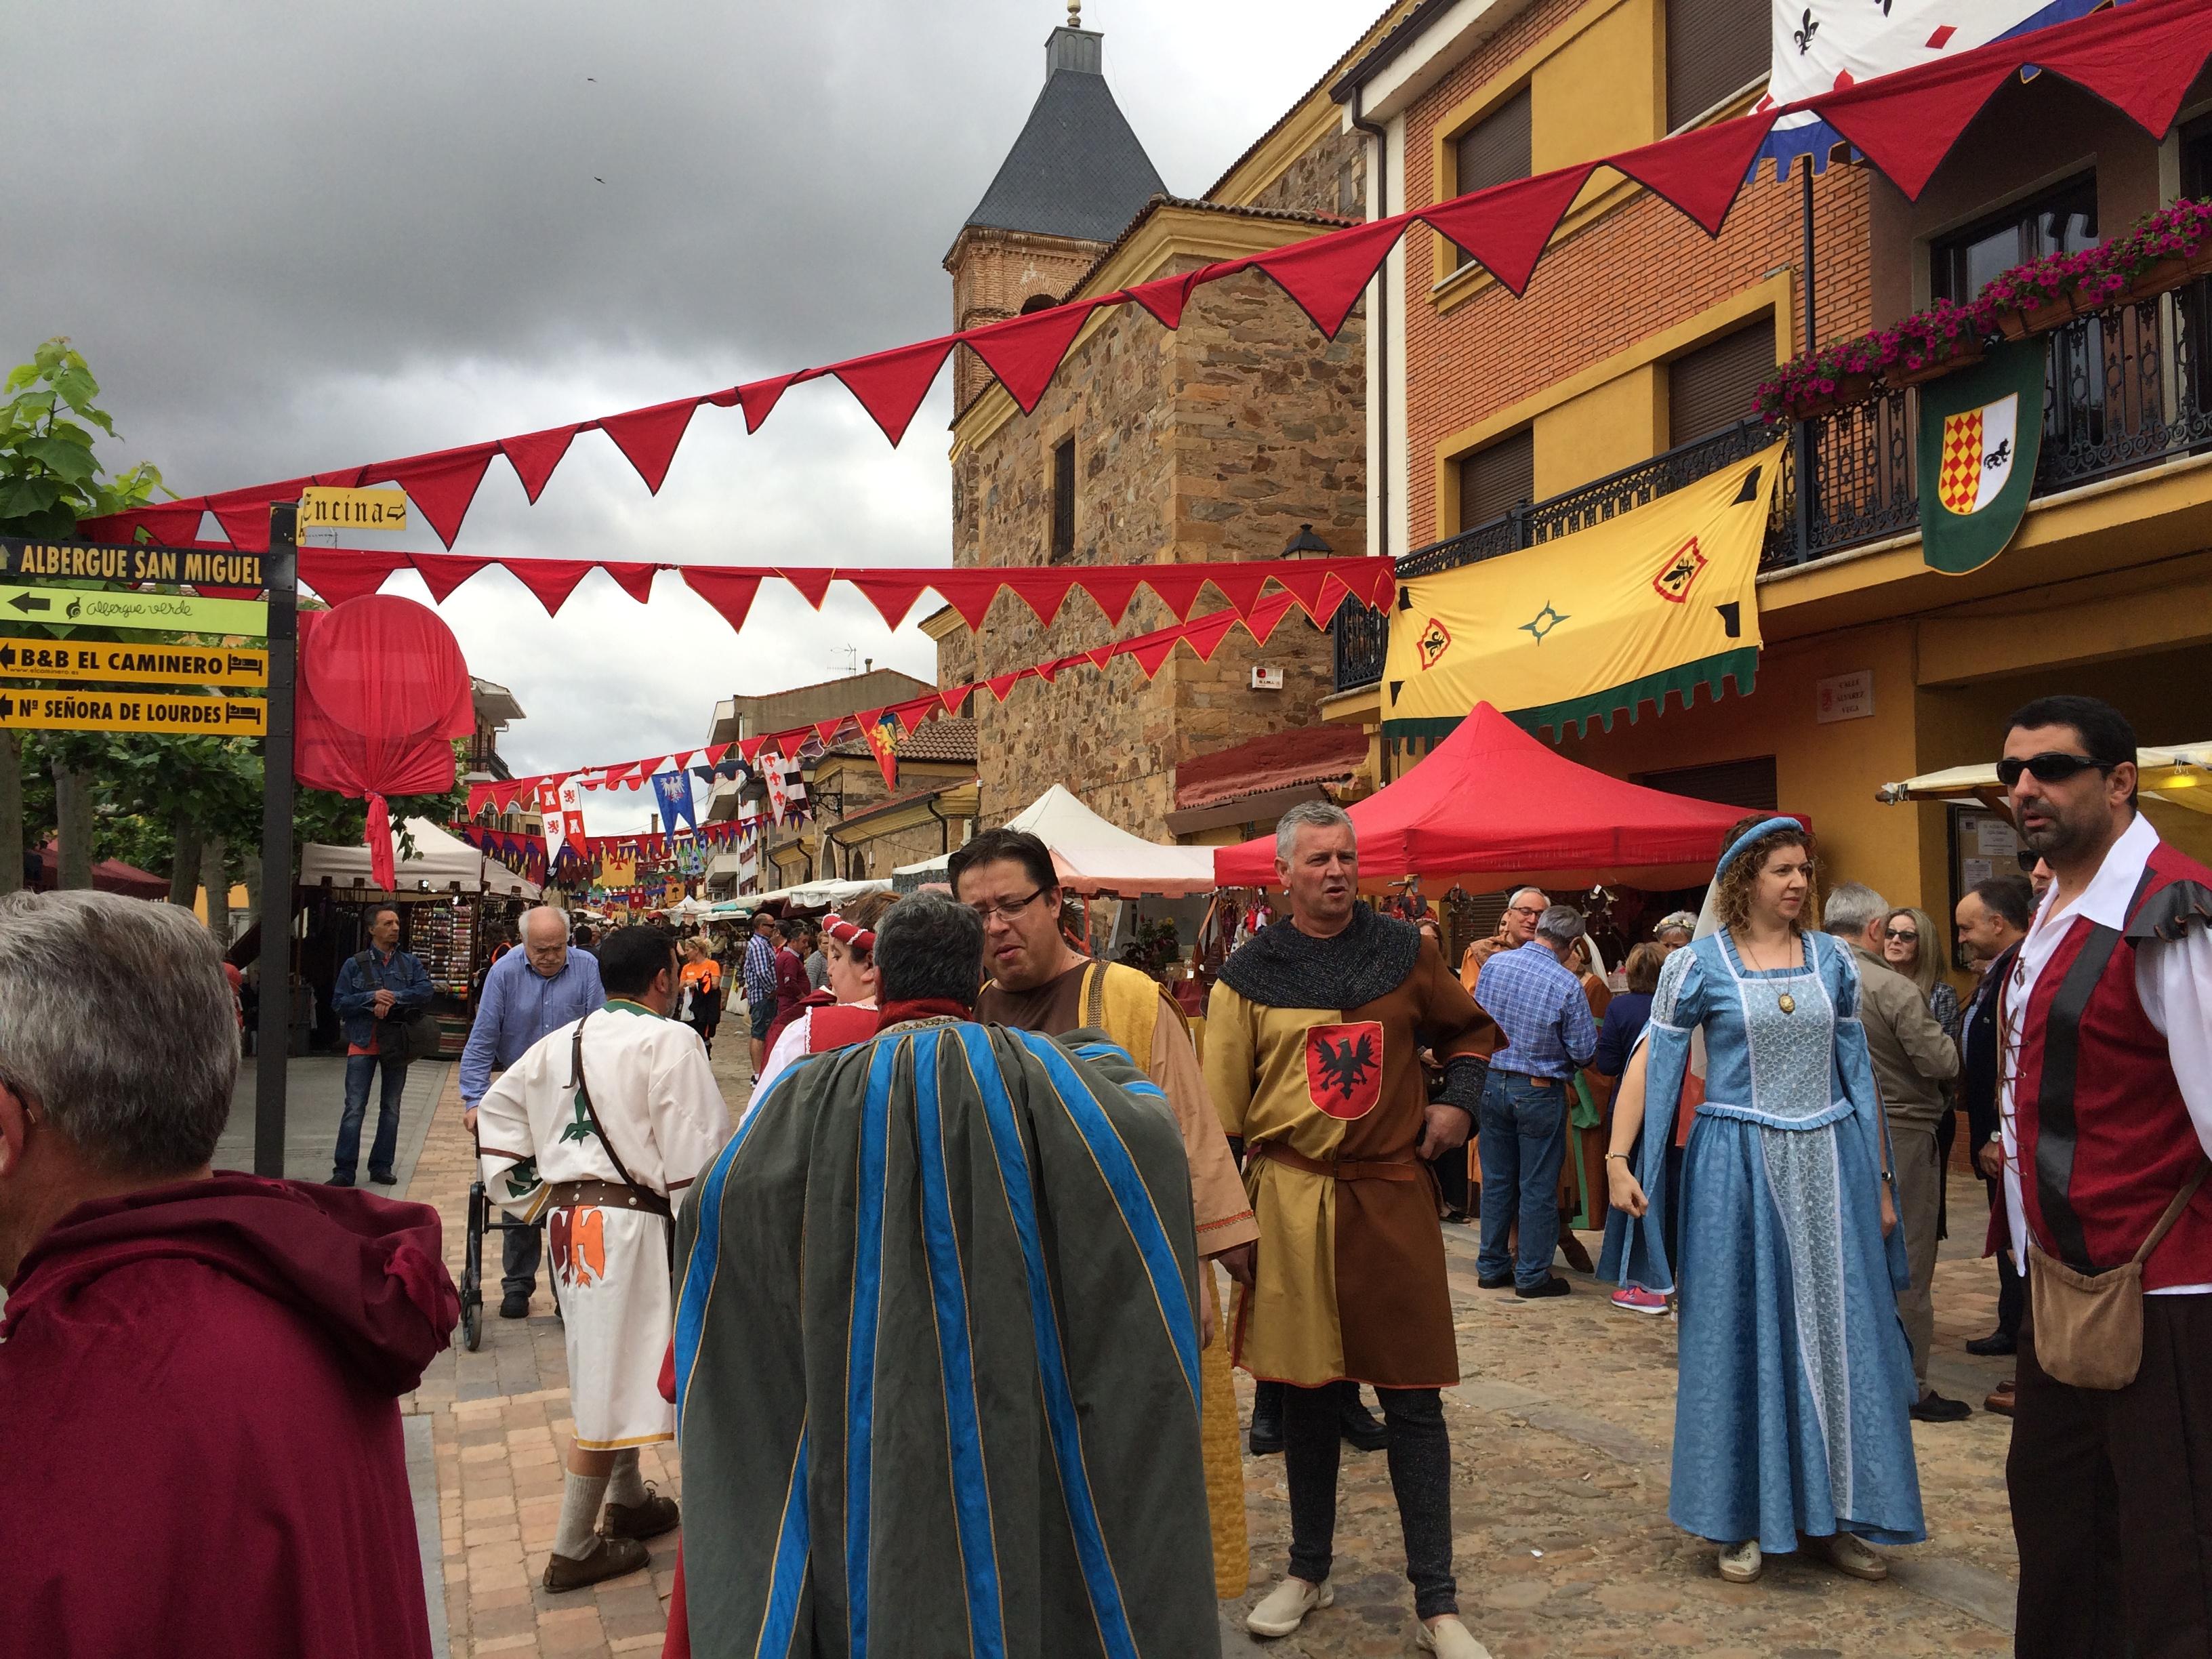 Day 31 - Villar de Mazarife to Santibáñez de Valdeiglesias - June 4, 2017